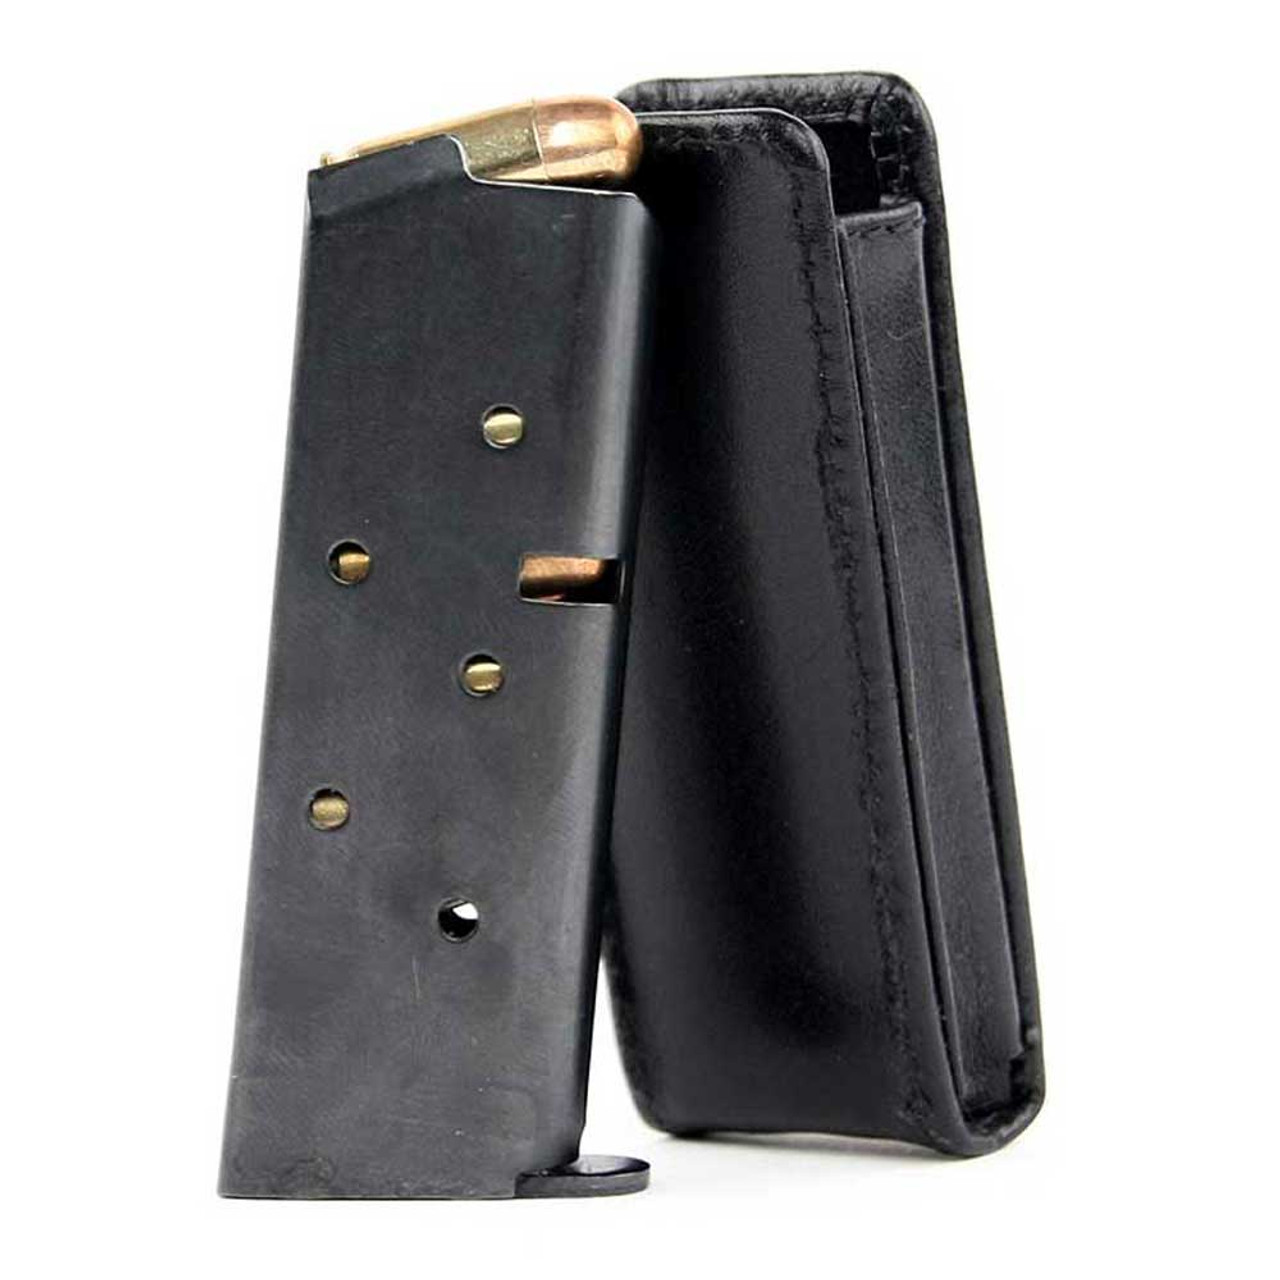 .380 Magazine Pocket Protectors